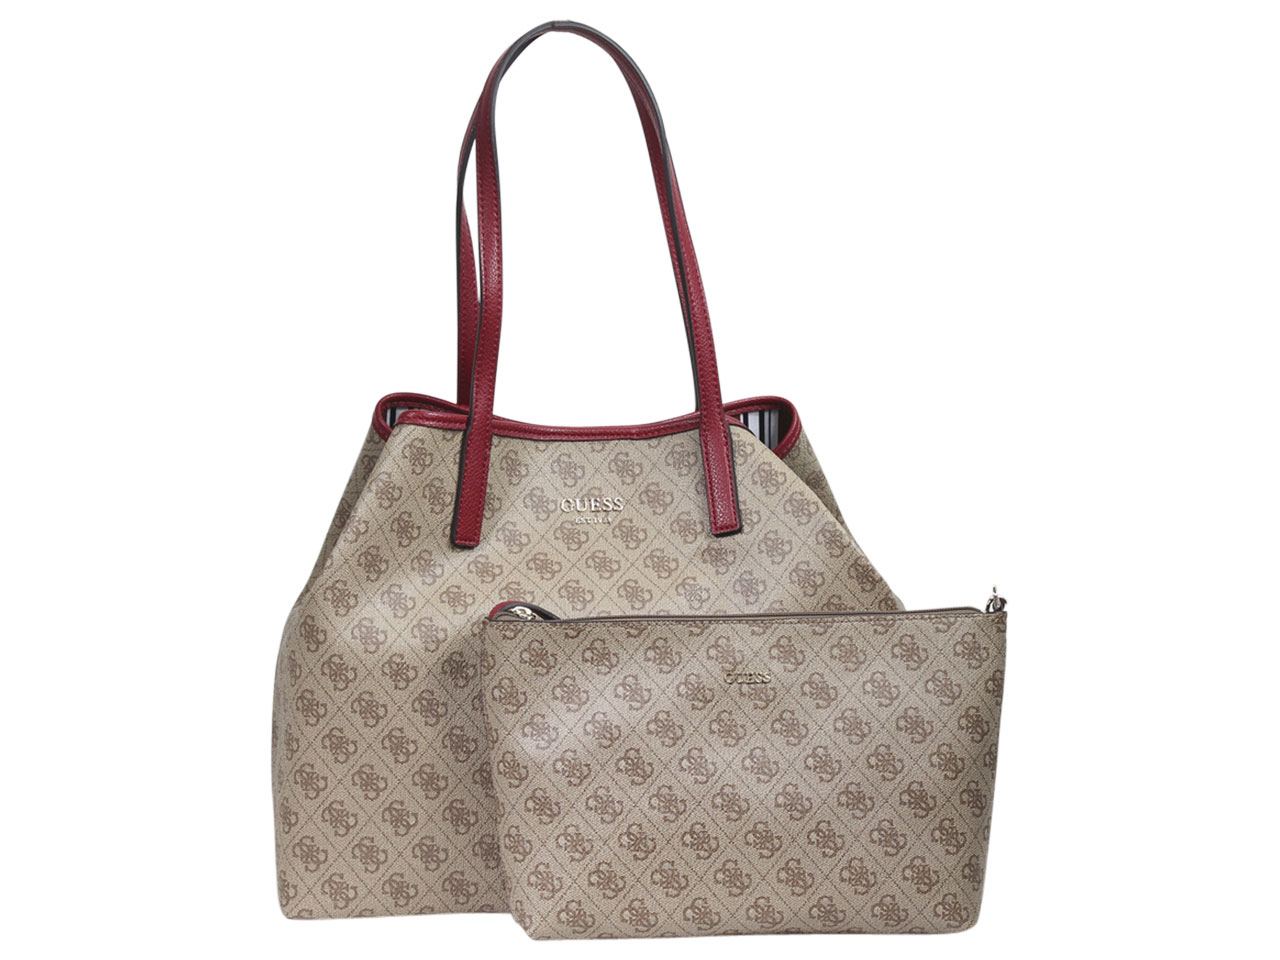 58c72be153a Guess Women s Vikky Large Tote Handbag Set   eBay